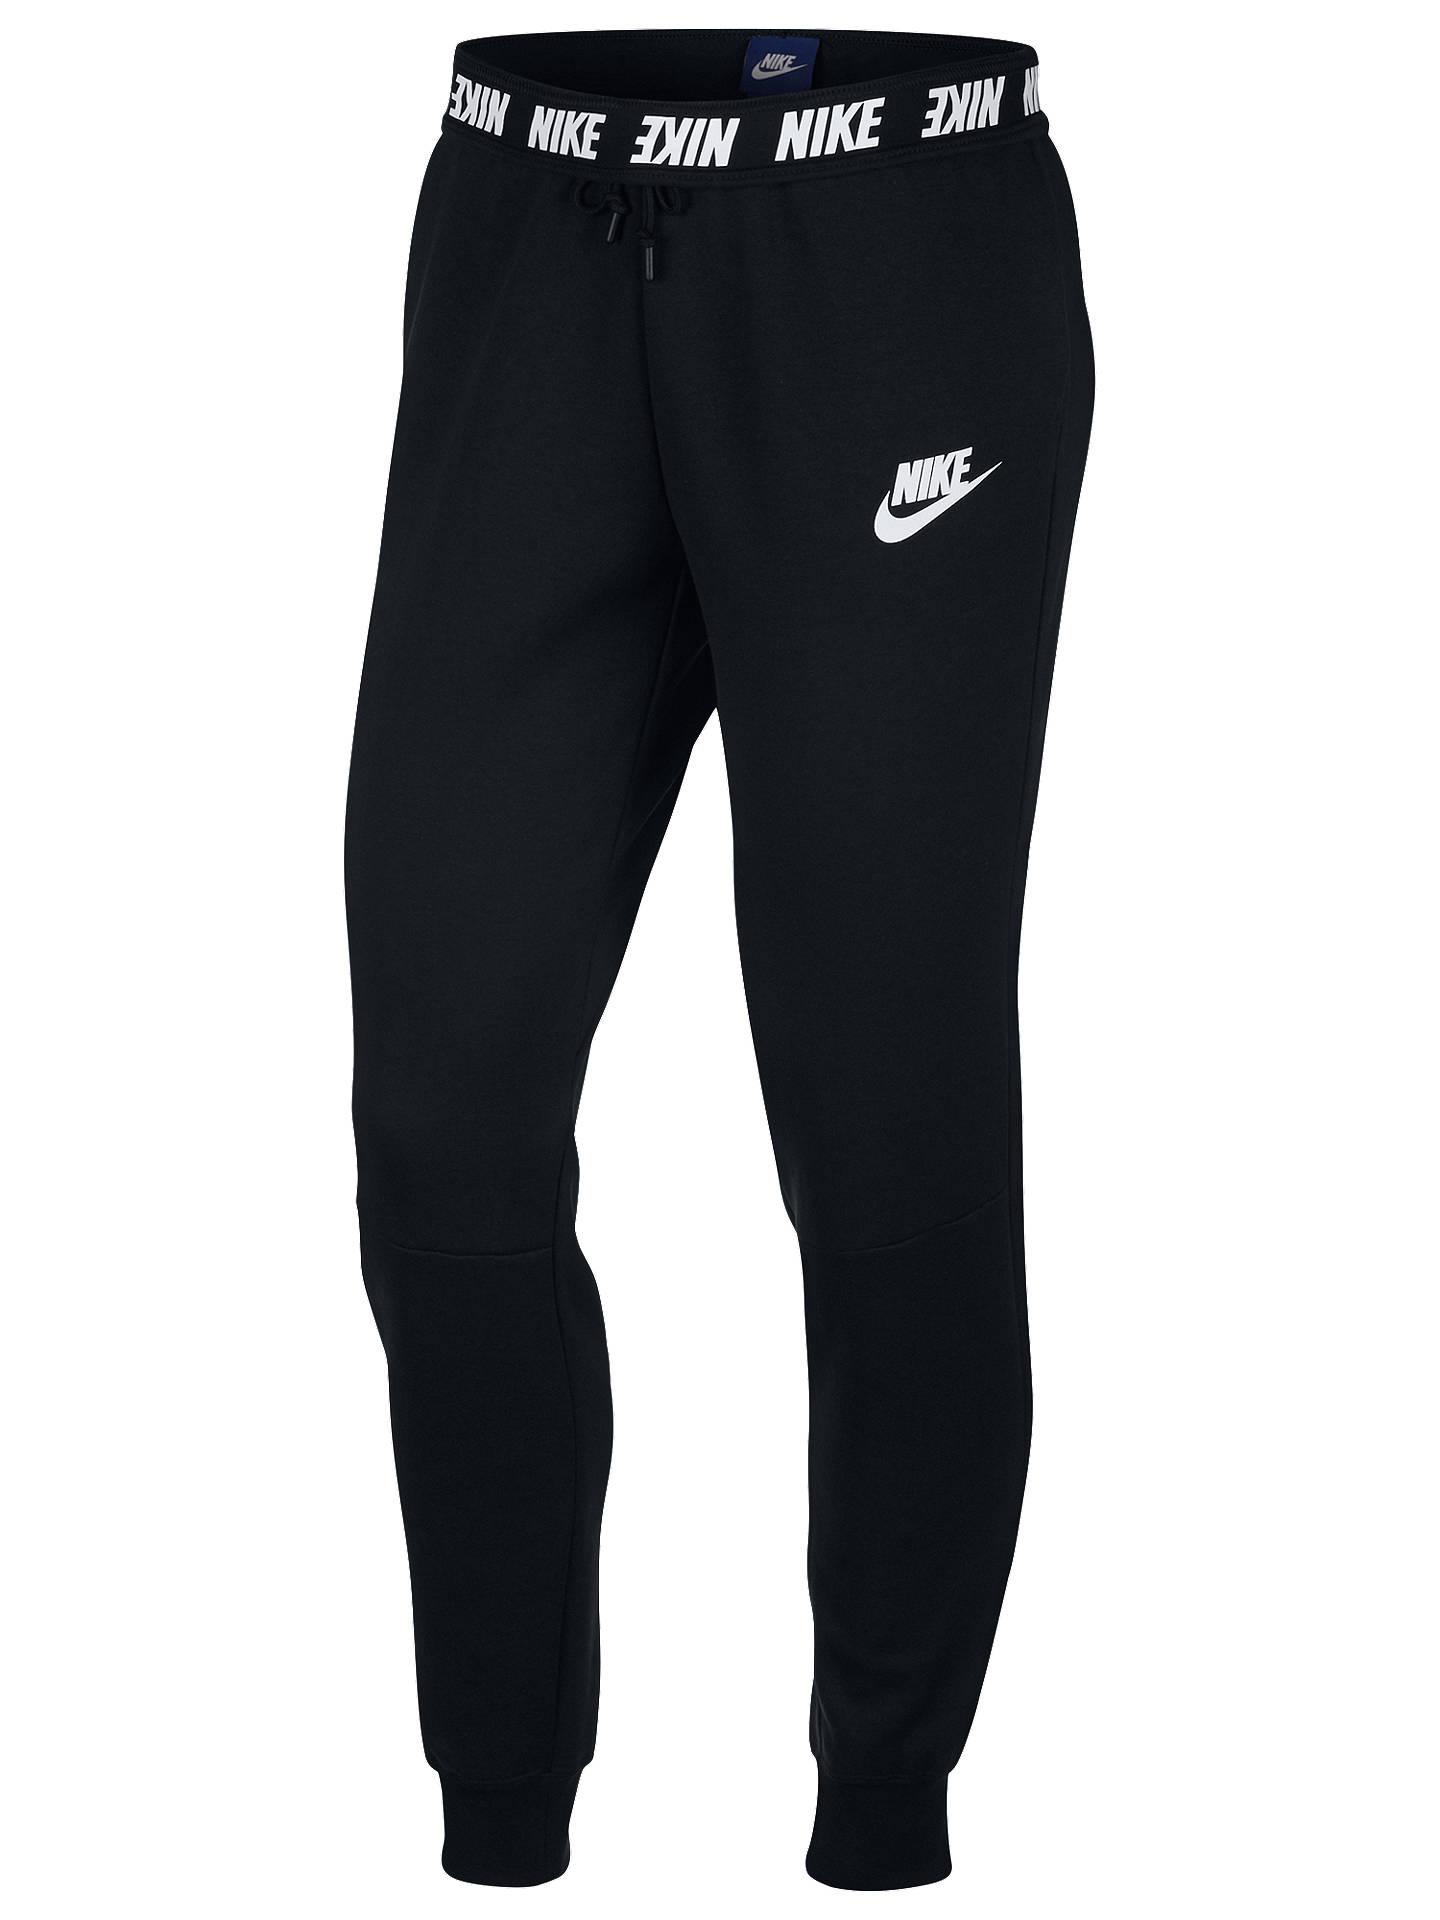 BuyNike Sportswear Optic Tracksuit Bottoms 76afa08038e4